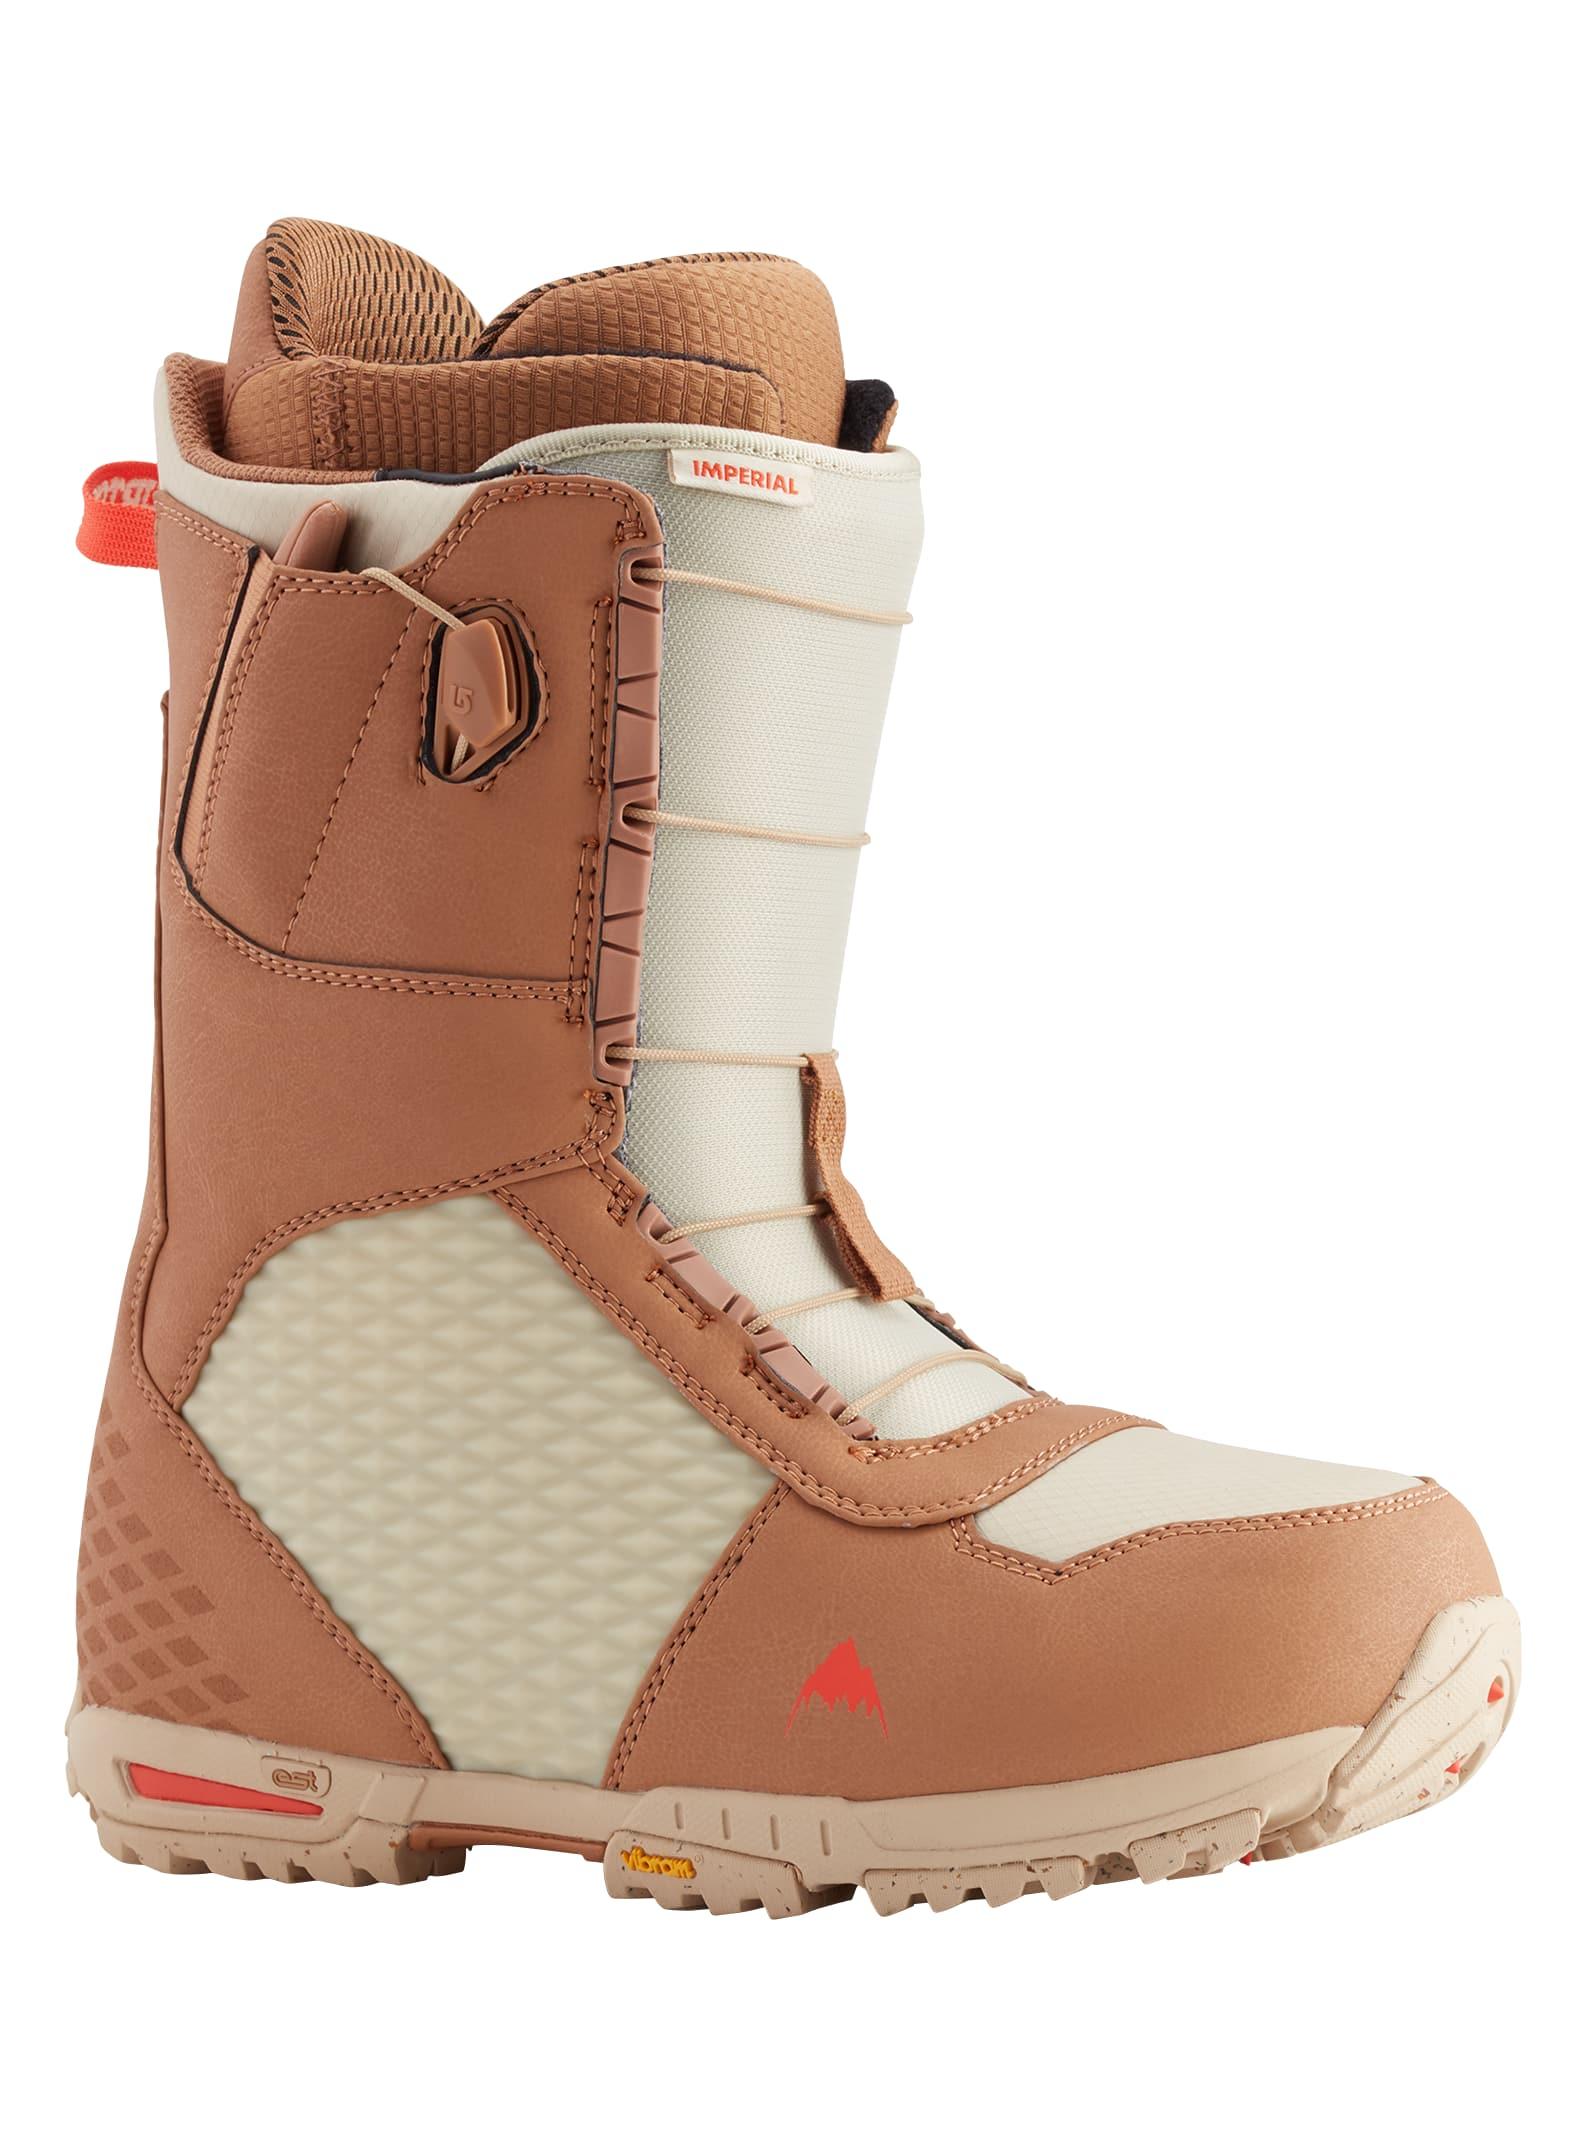 Snowboard Boots | Burton Snowboards